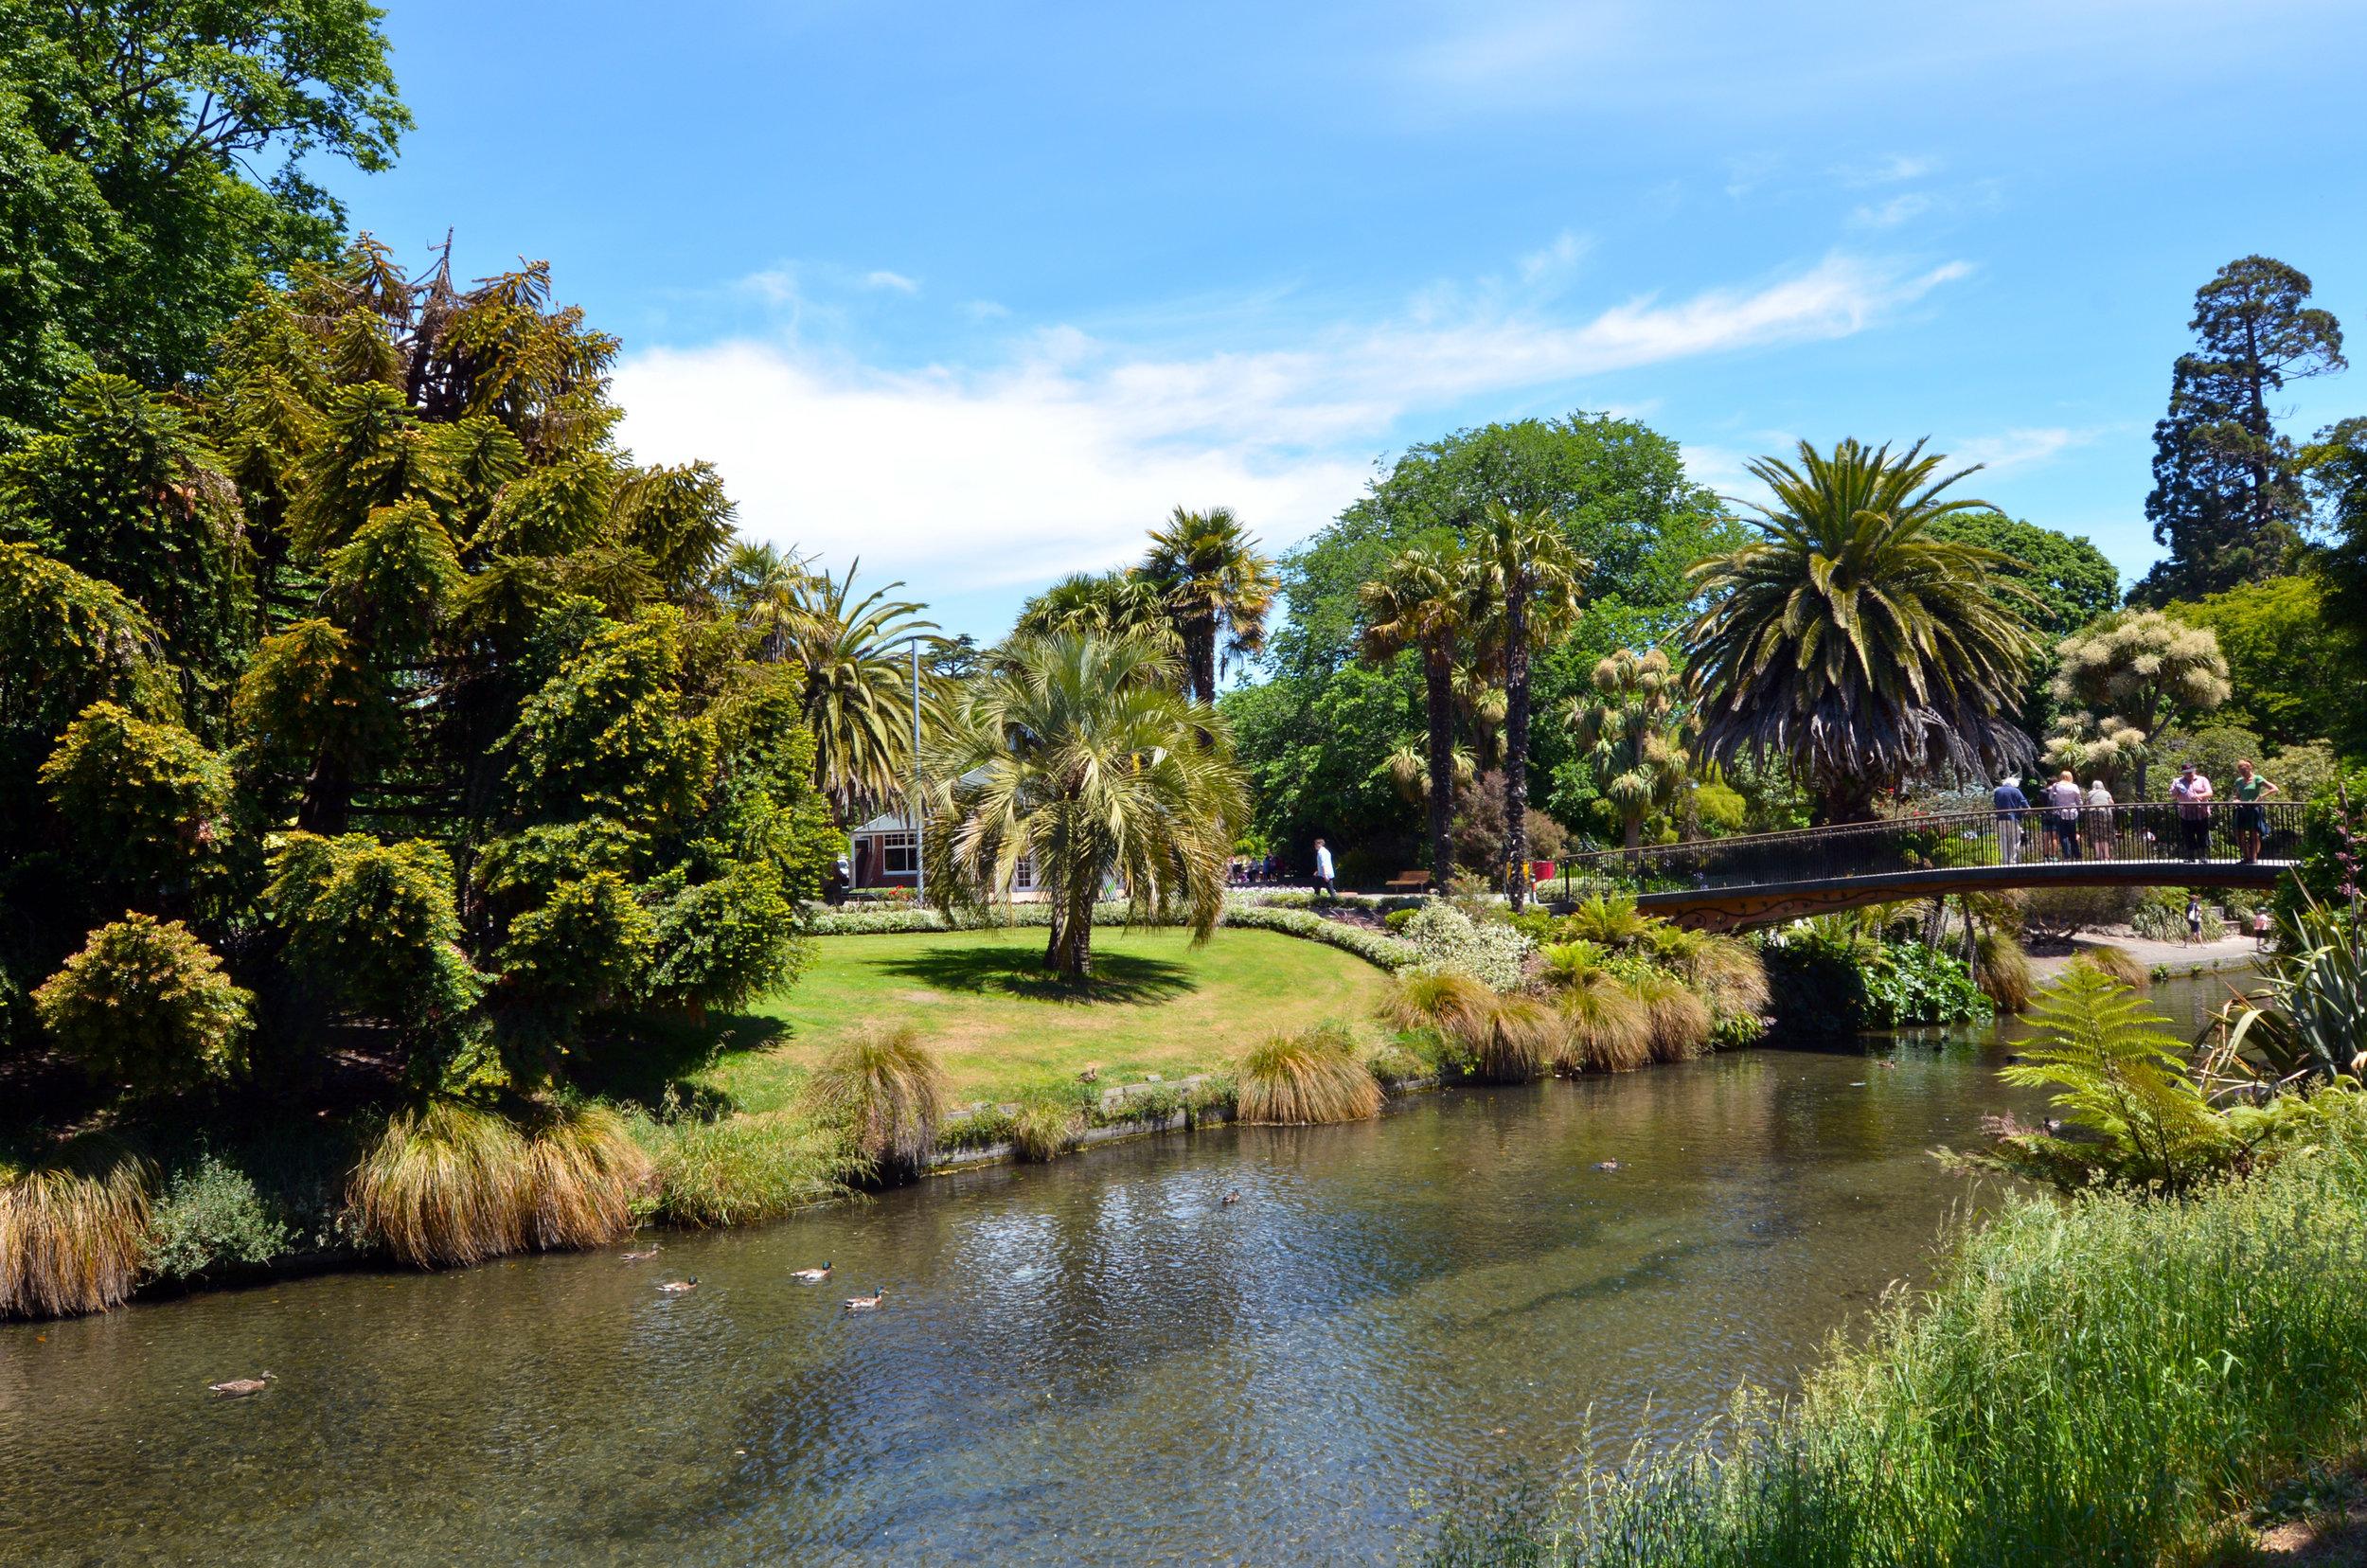 Christchurch Botanic Gardens, New Zealand. Photo: Rafael Ben-Ari, Adobe Stock.